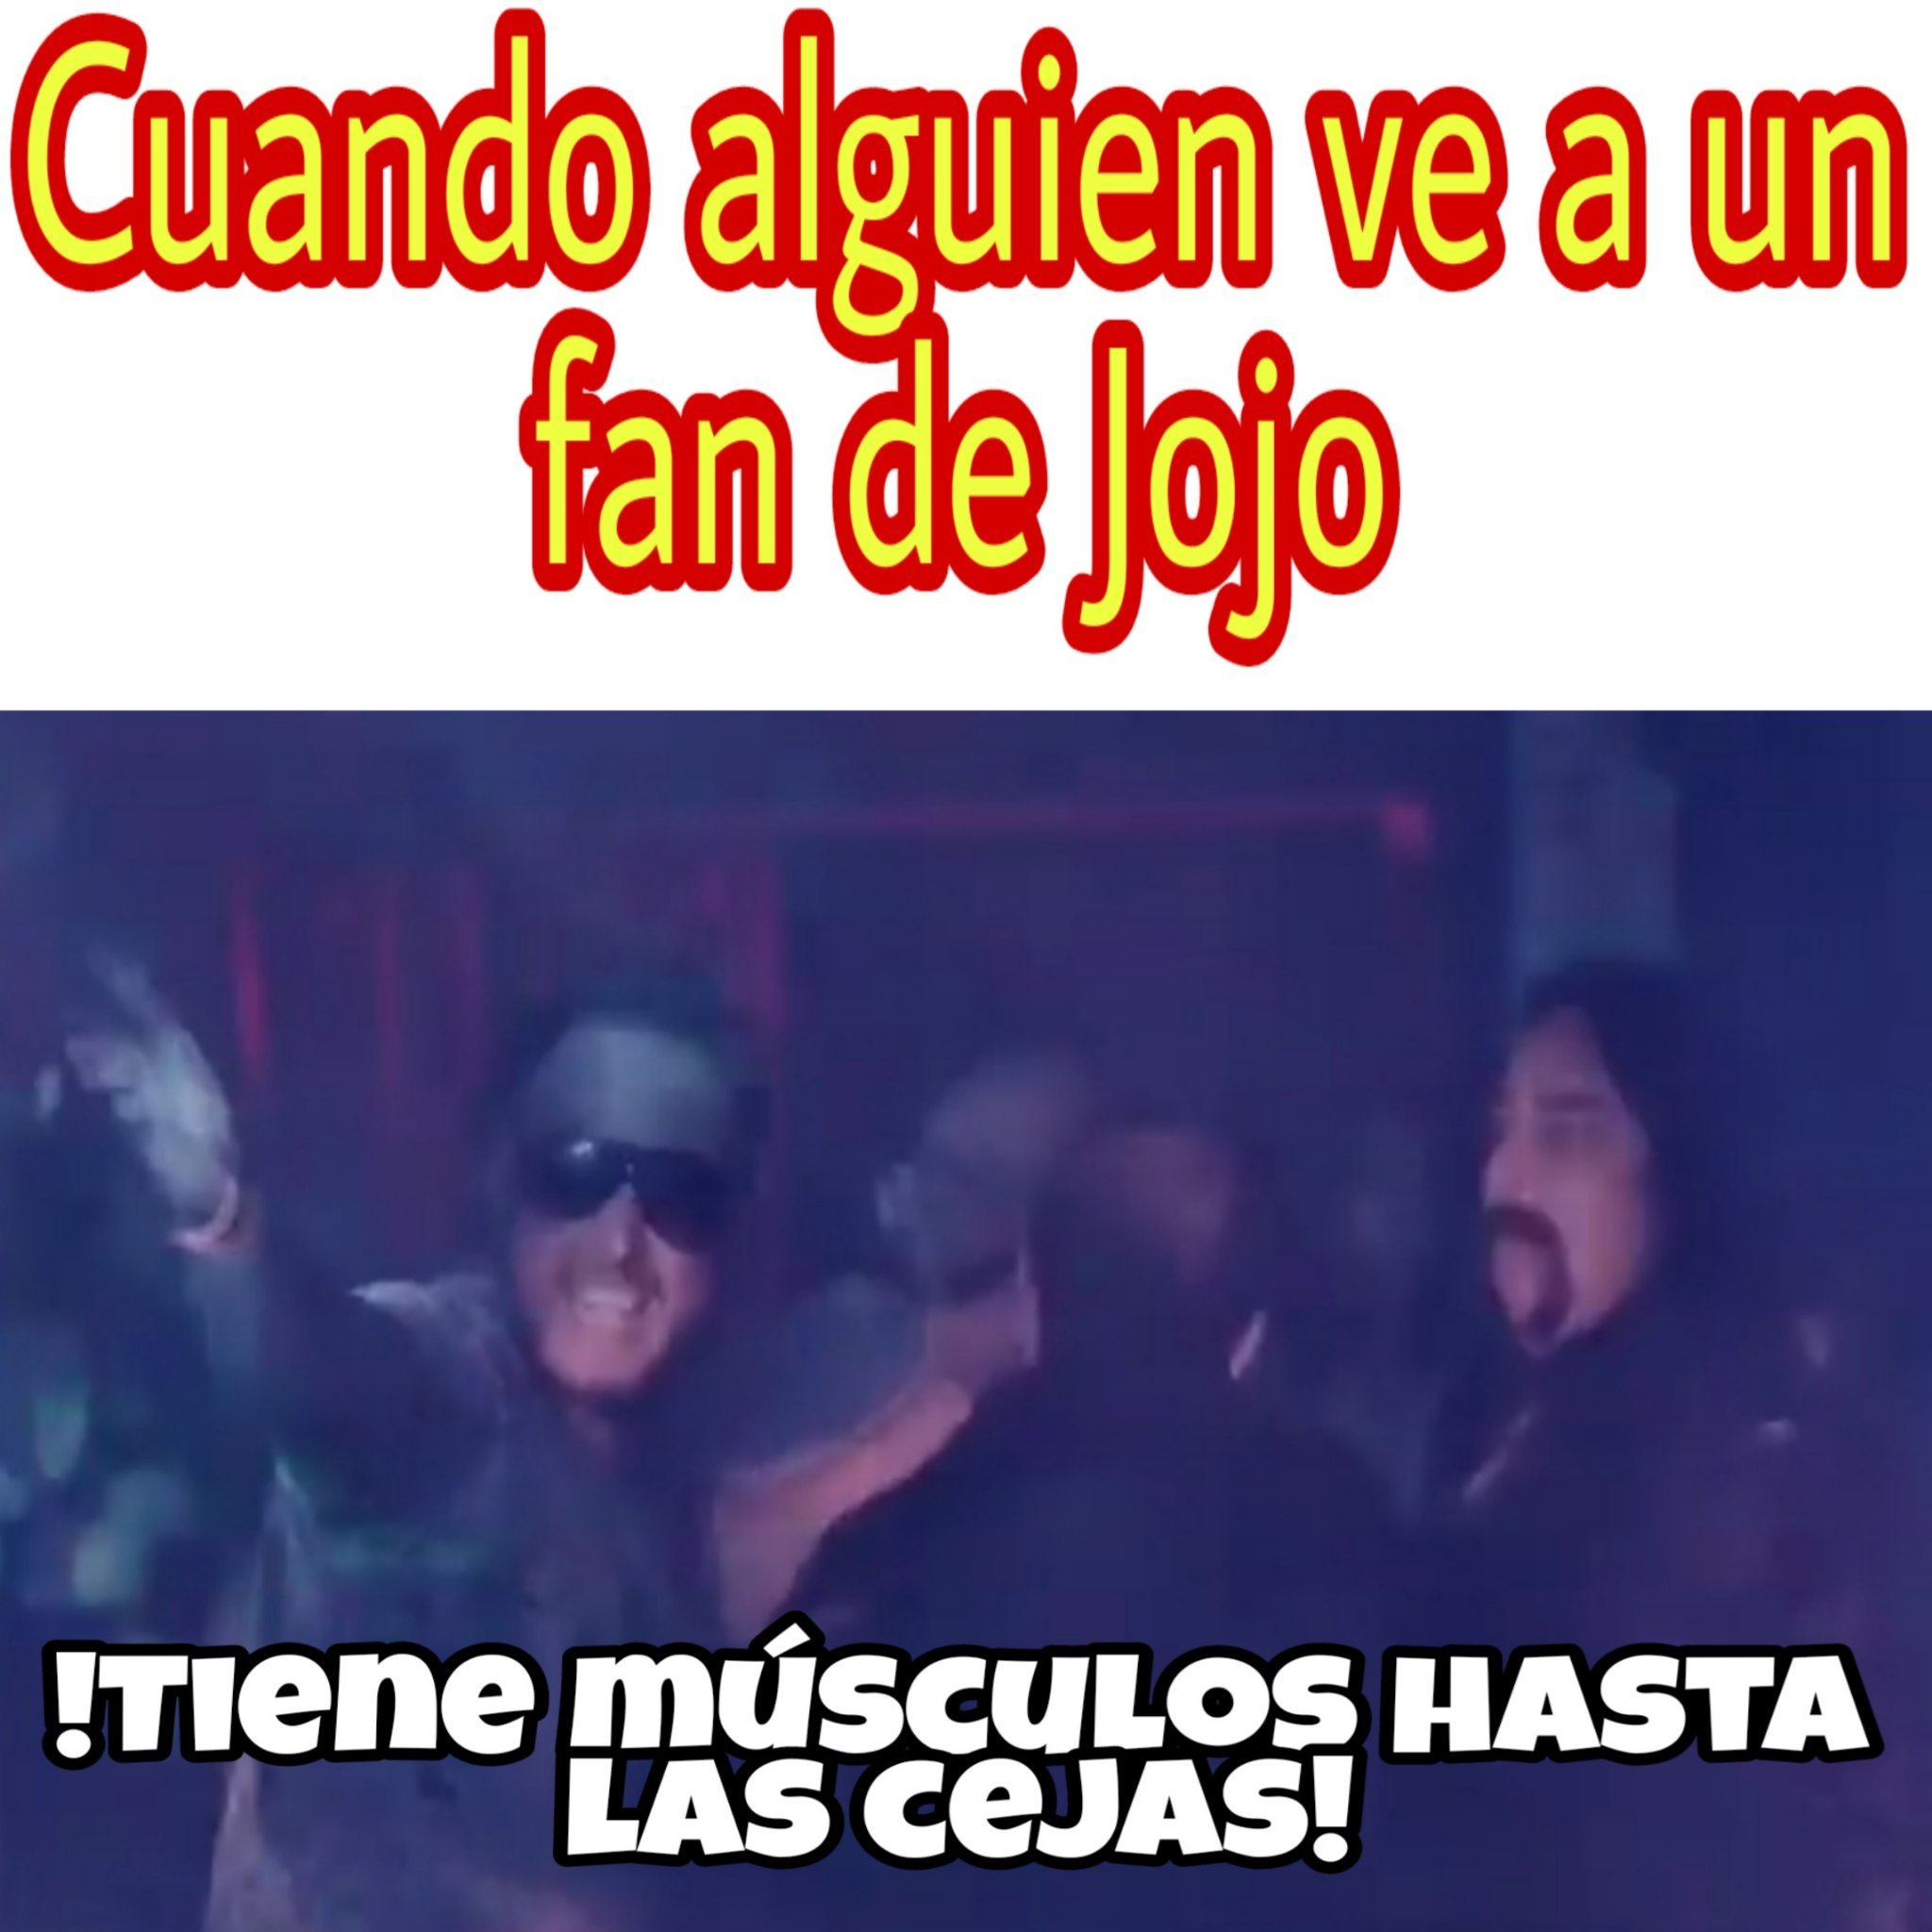 Jojo 4 lyf - meme